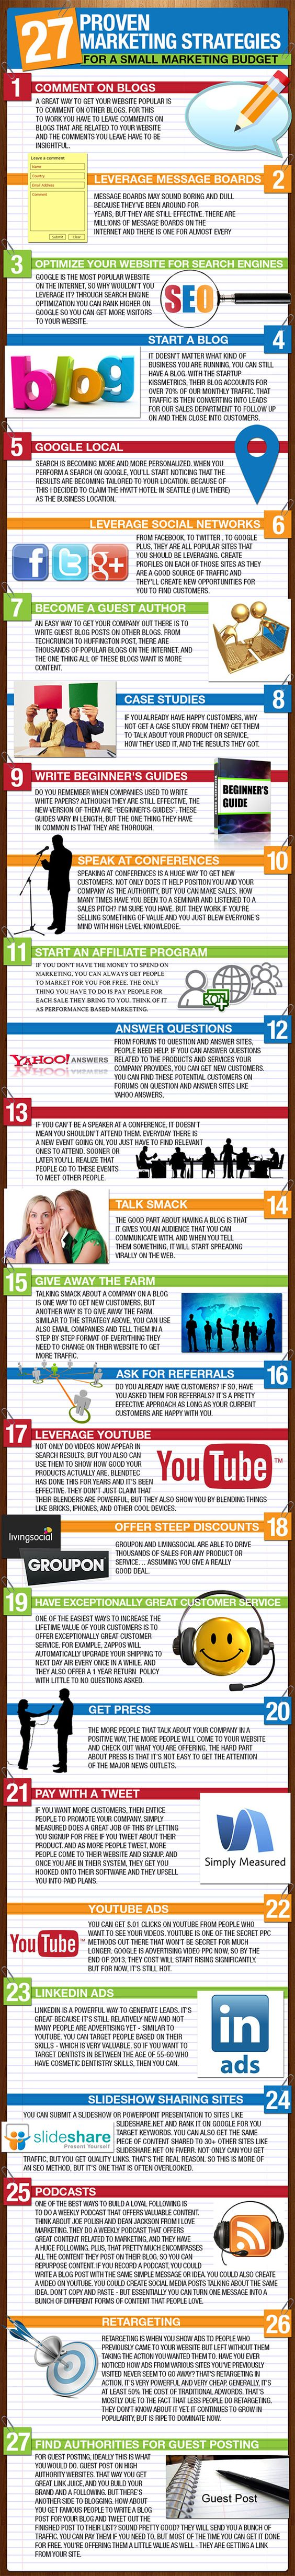 27 Marketing Trends.jpg